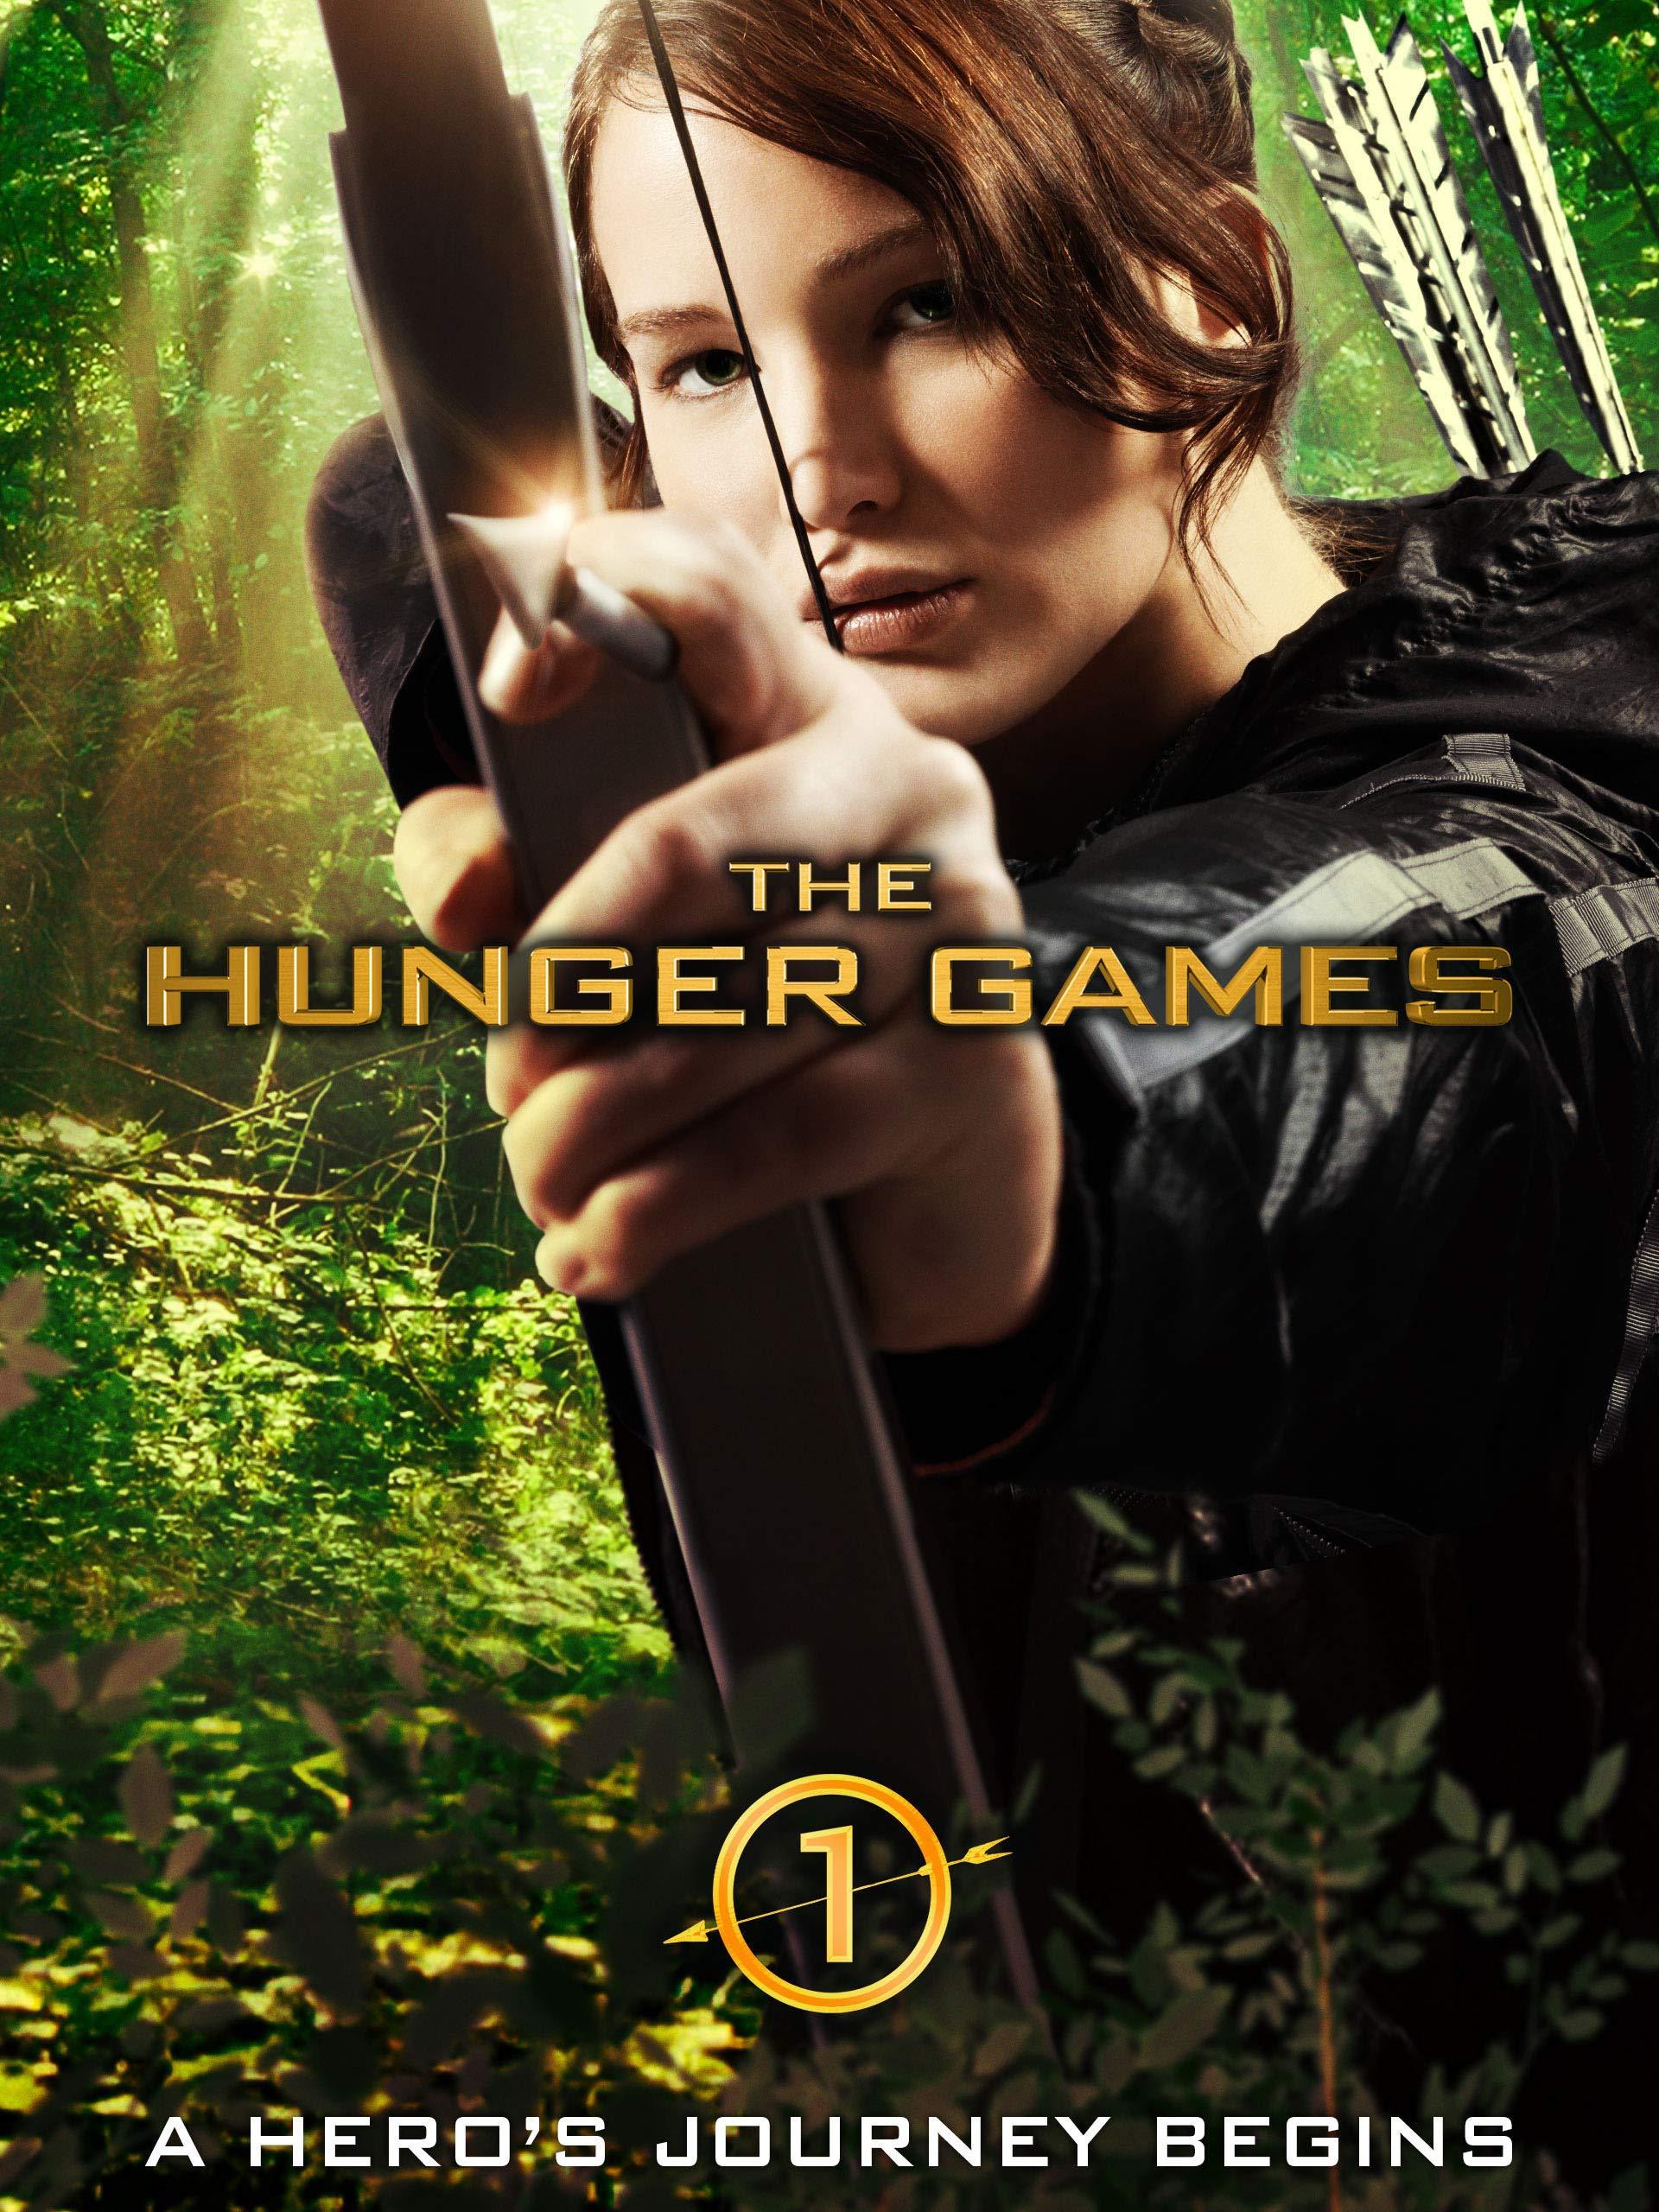 The Hunger Games (4K UHD) on Amazon Prime Video UK